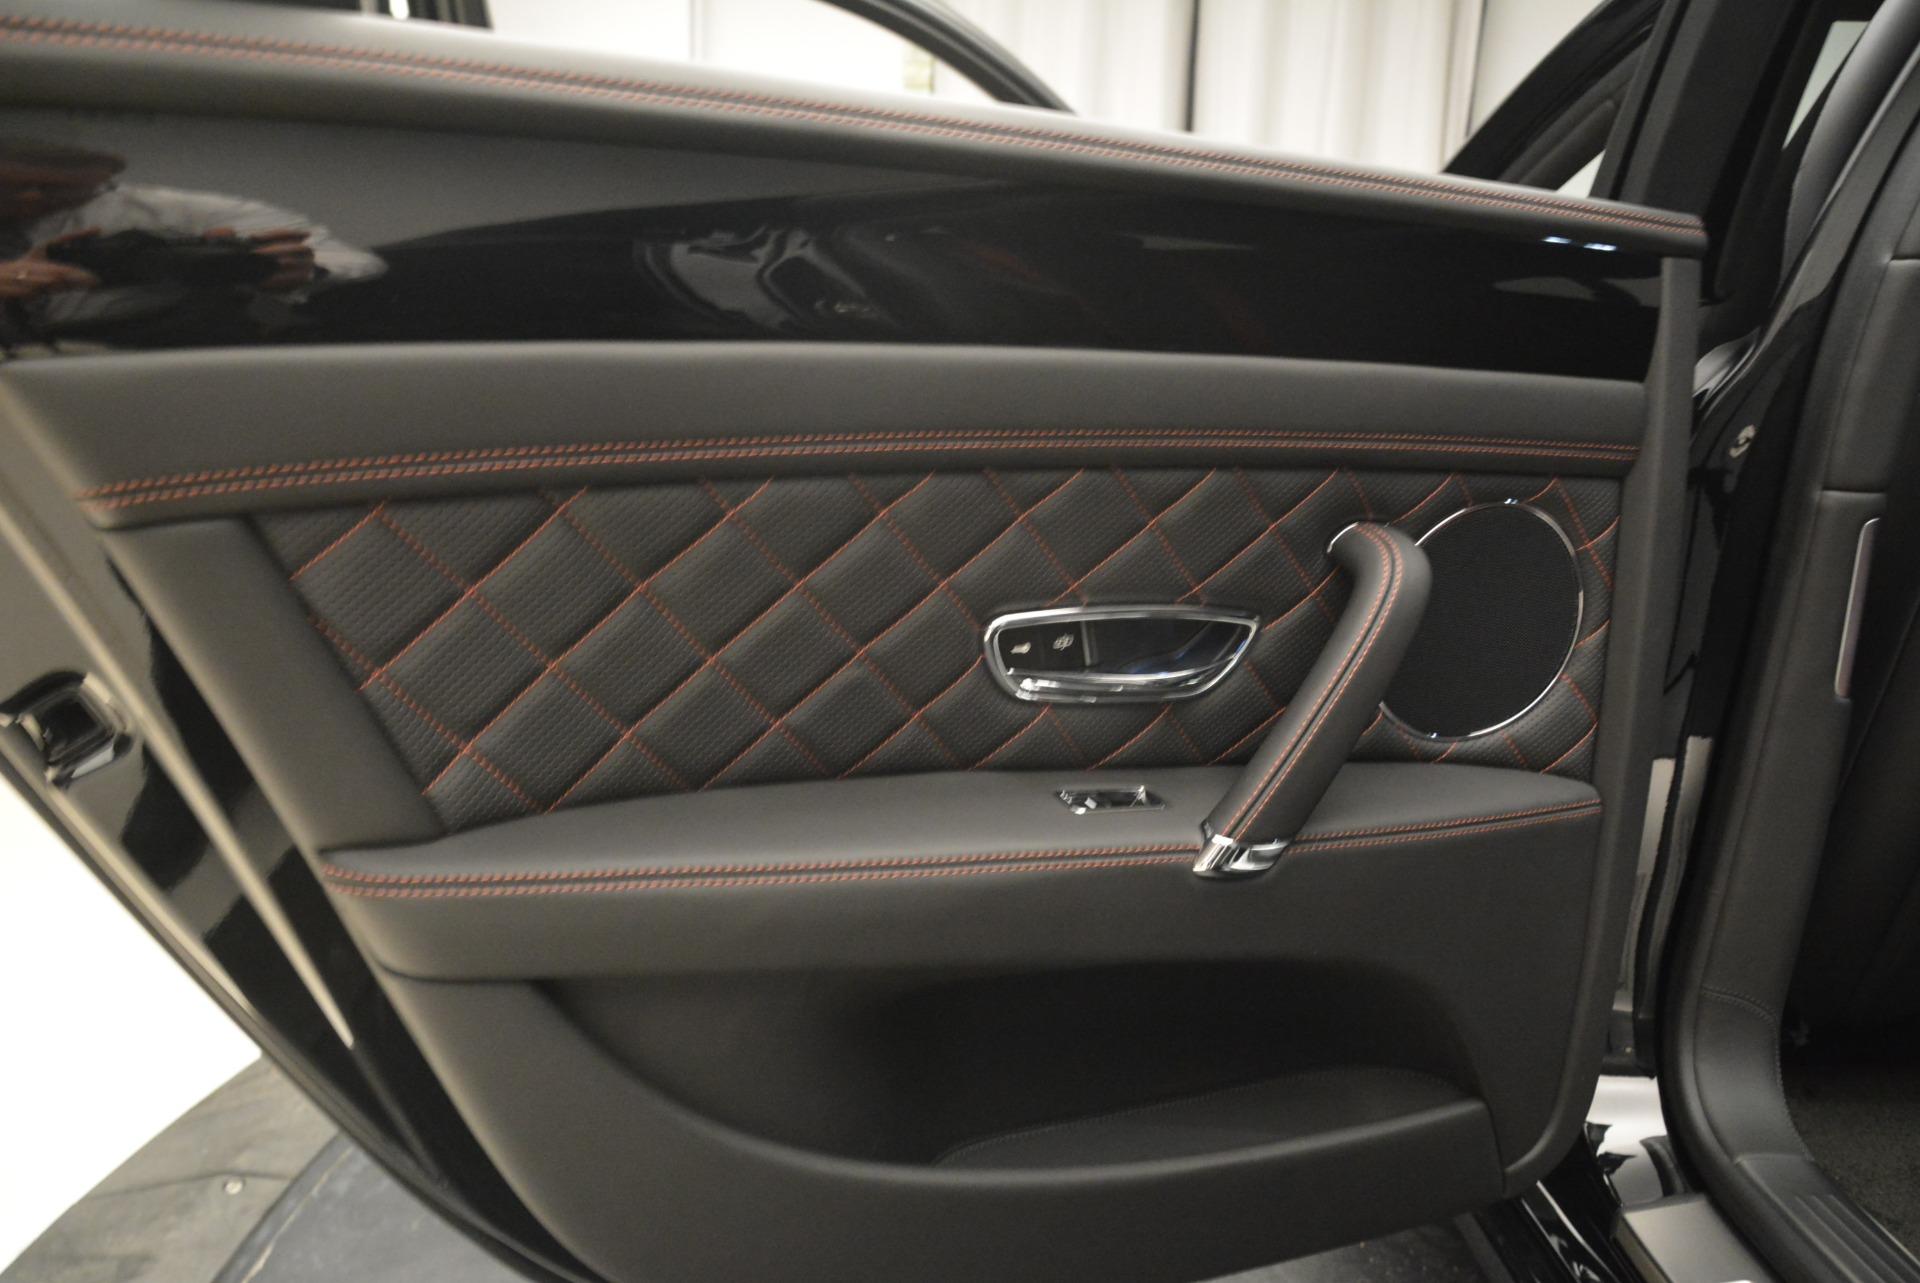 New 2018 Bentley Flying Spur V8 S Black Edition For Sale In Westport, CT 2073_p18